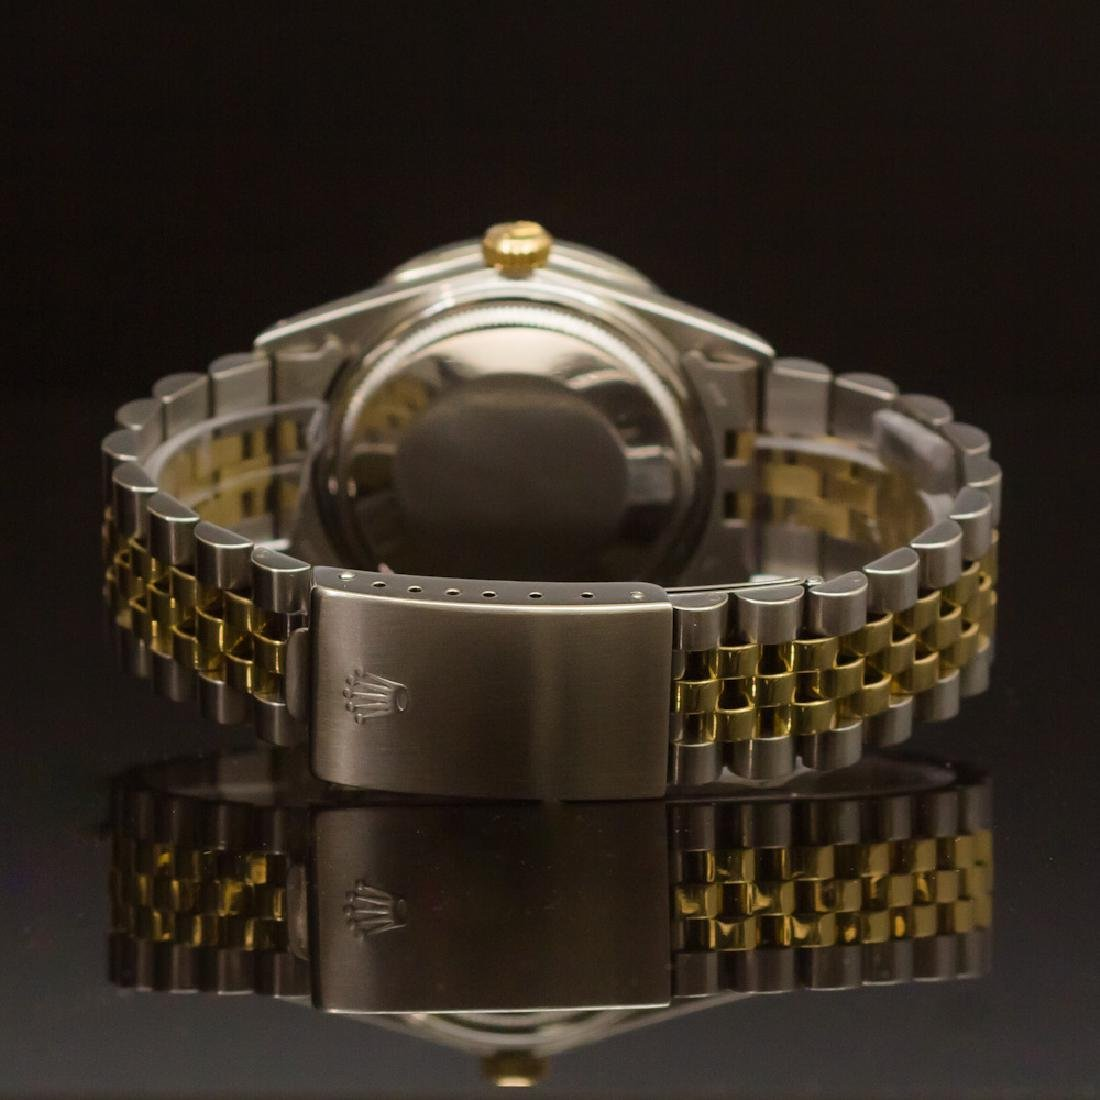 Rolex Two-Tone Datejust 36mm Custom Diamond Dial aprox. - 3